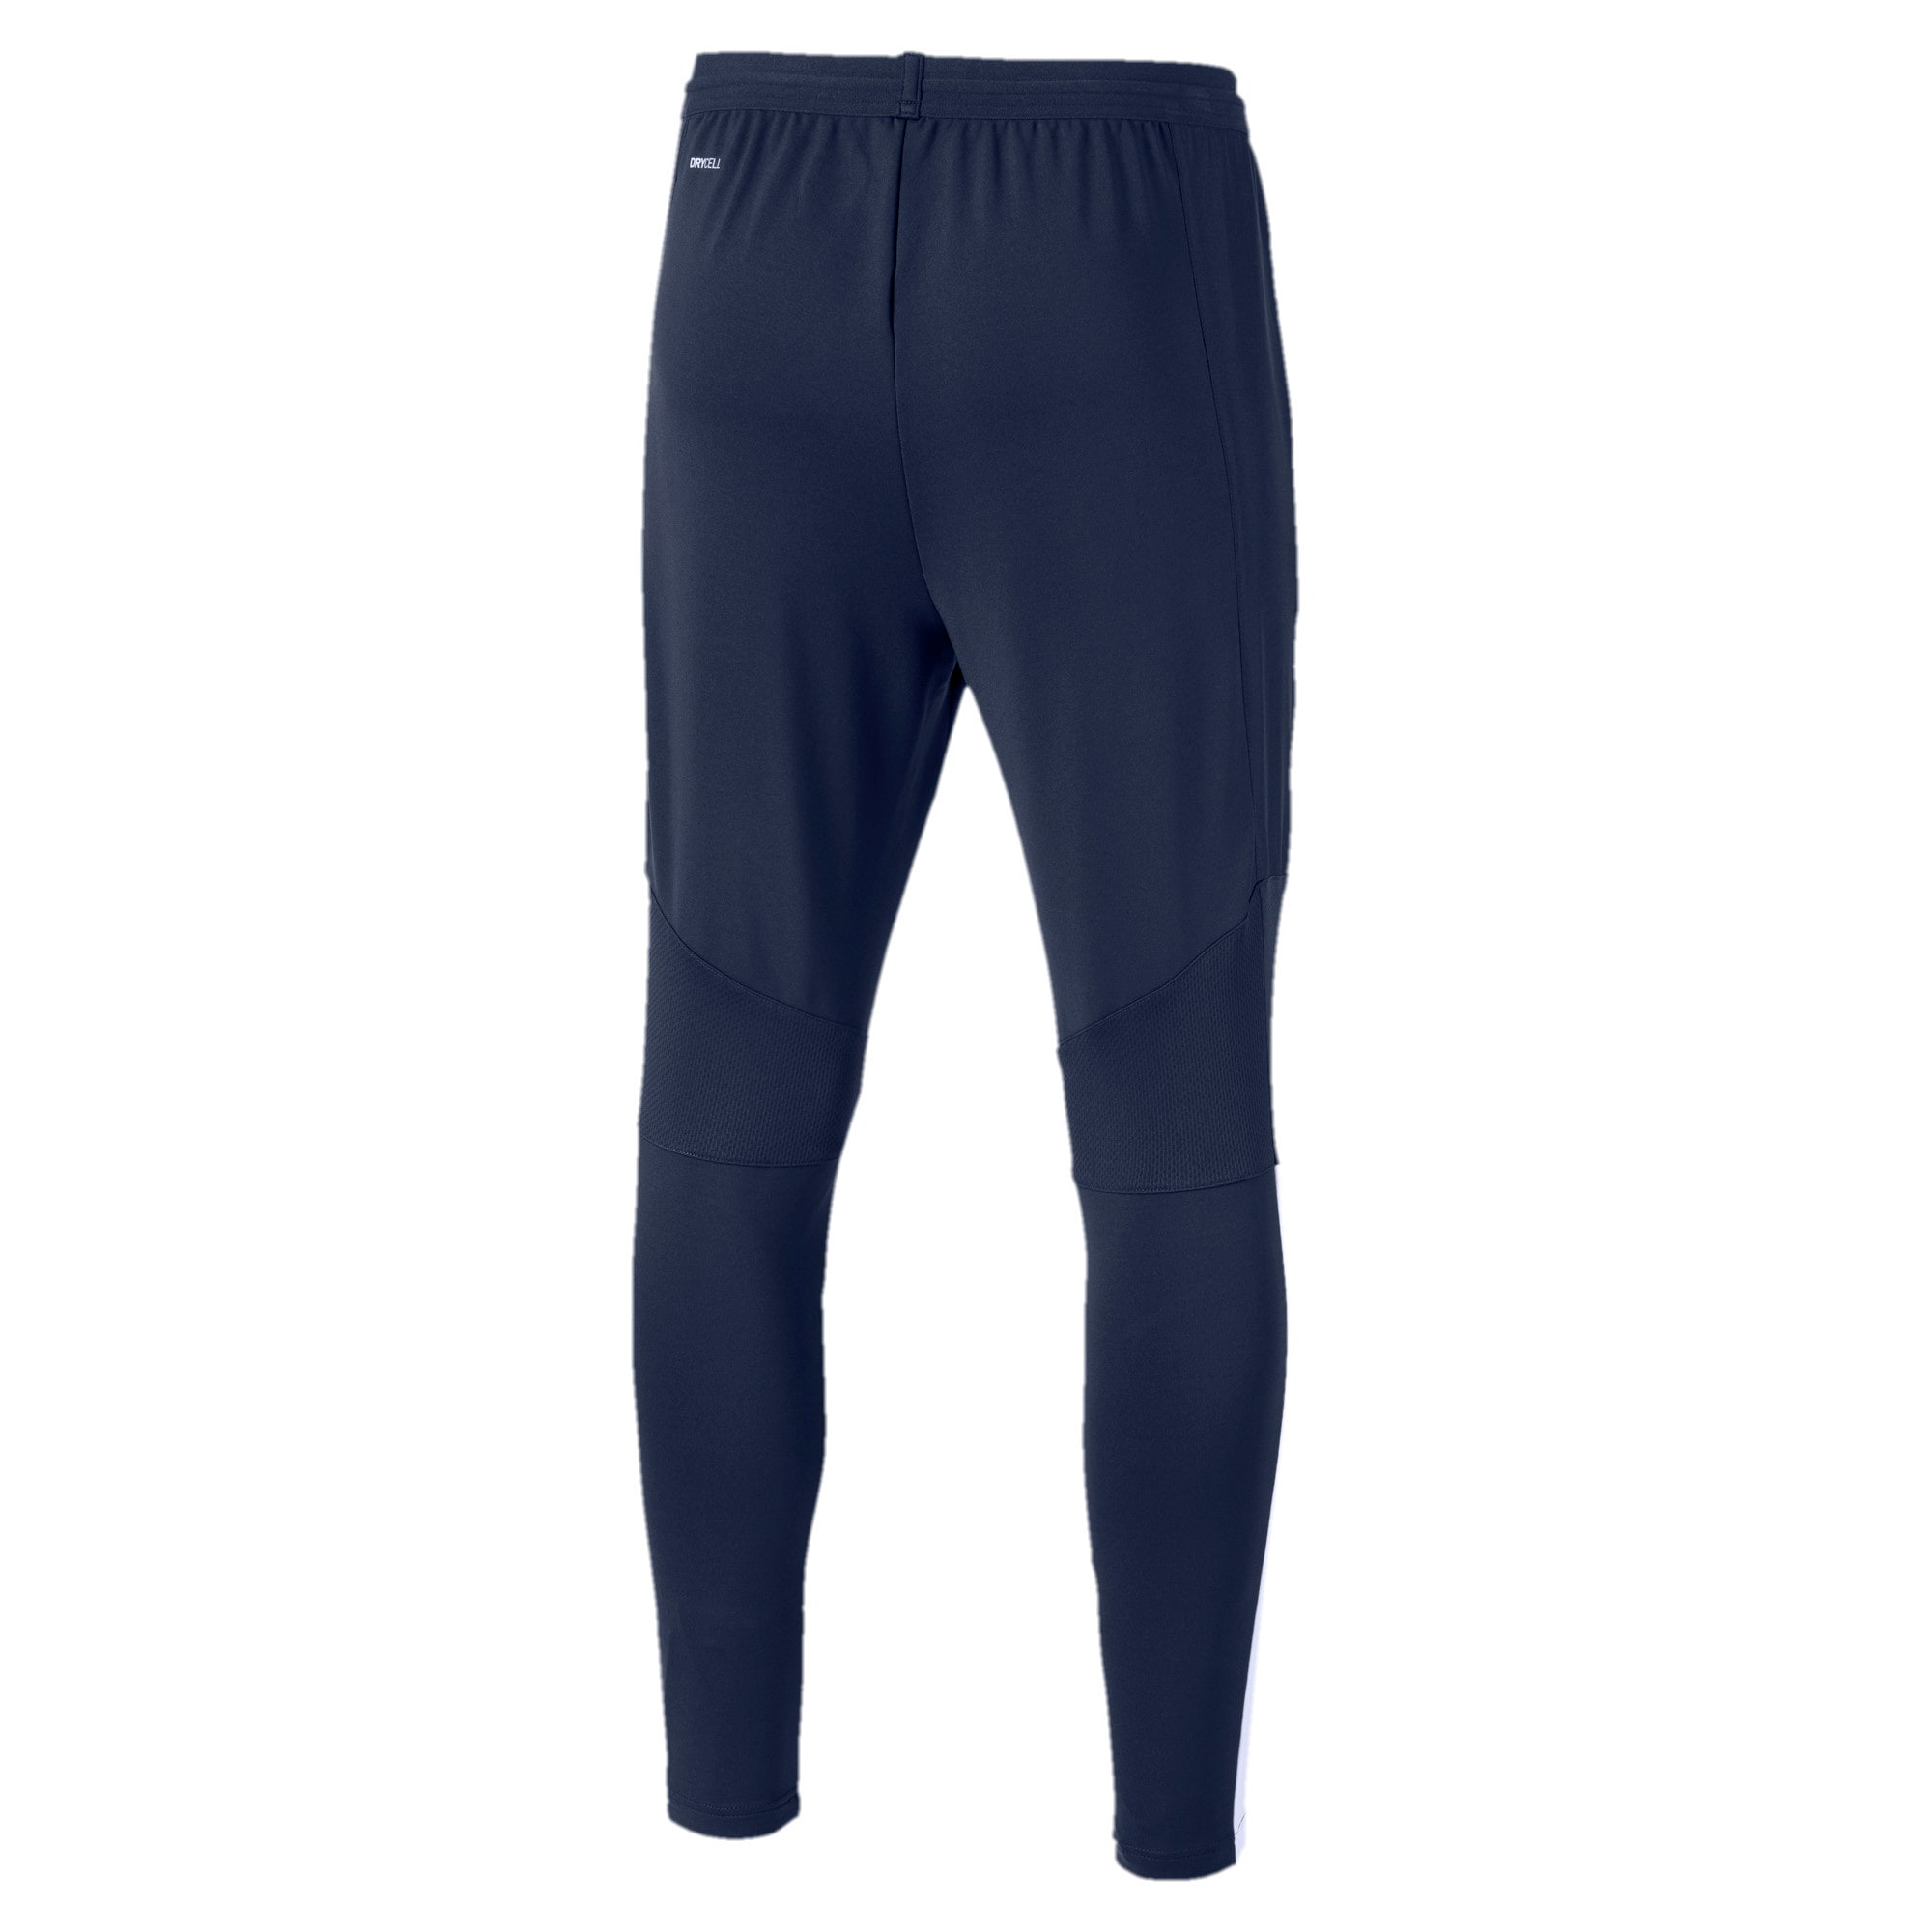 Thumbnail 5 of Chivas Men's Pro Training Pants, Peacoat, medium